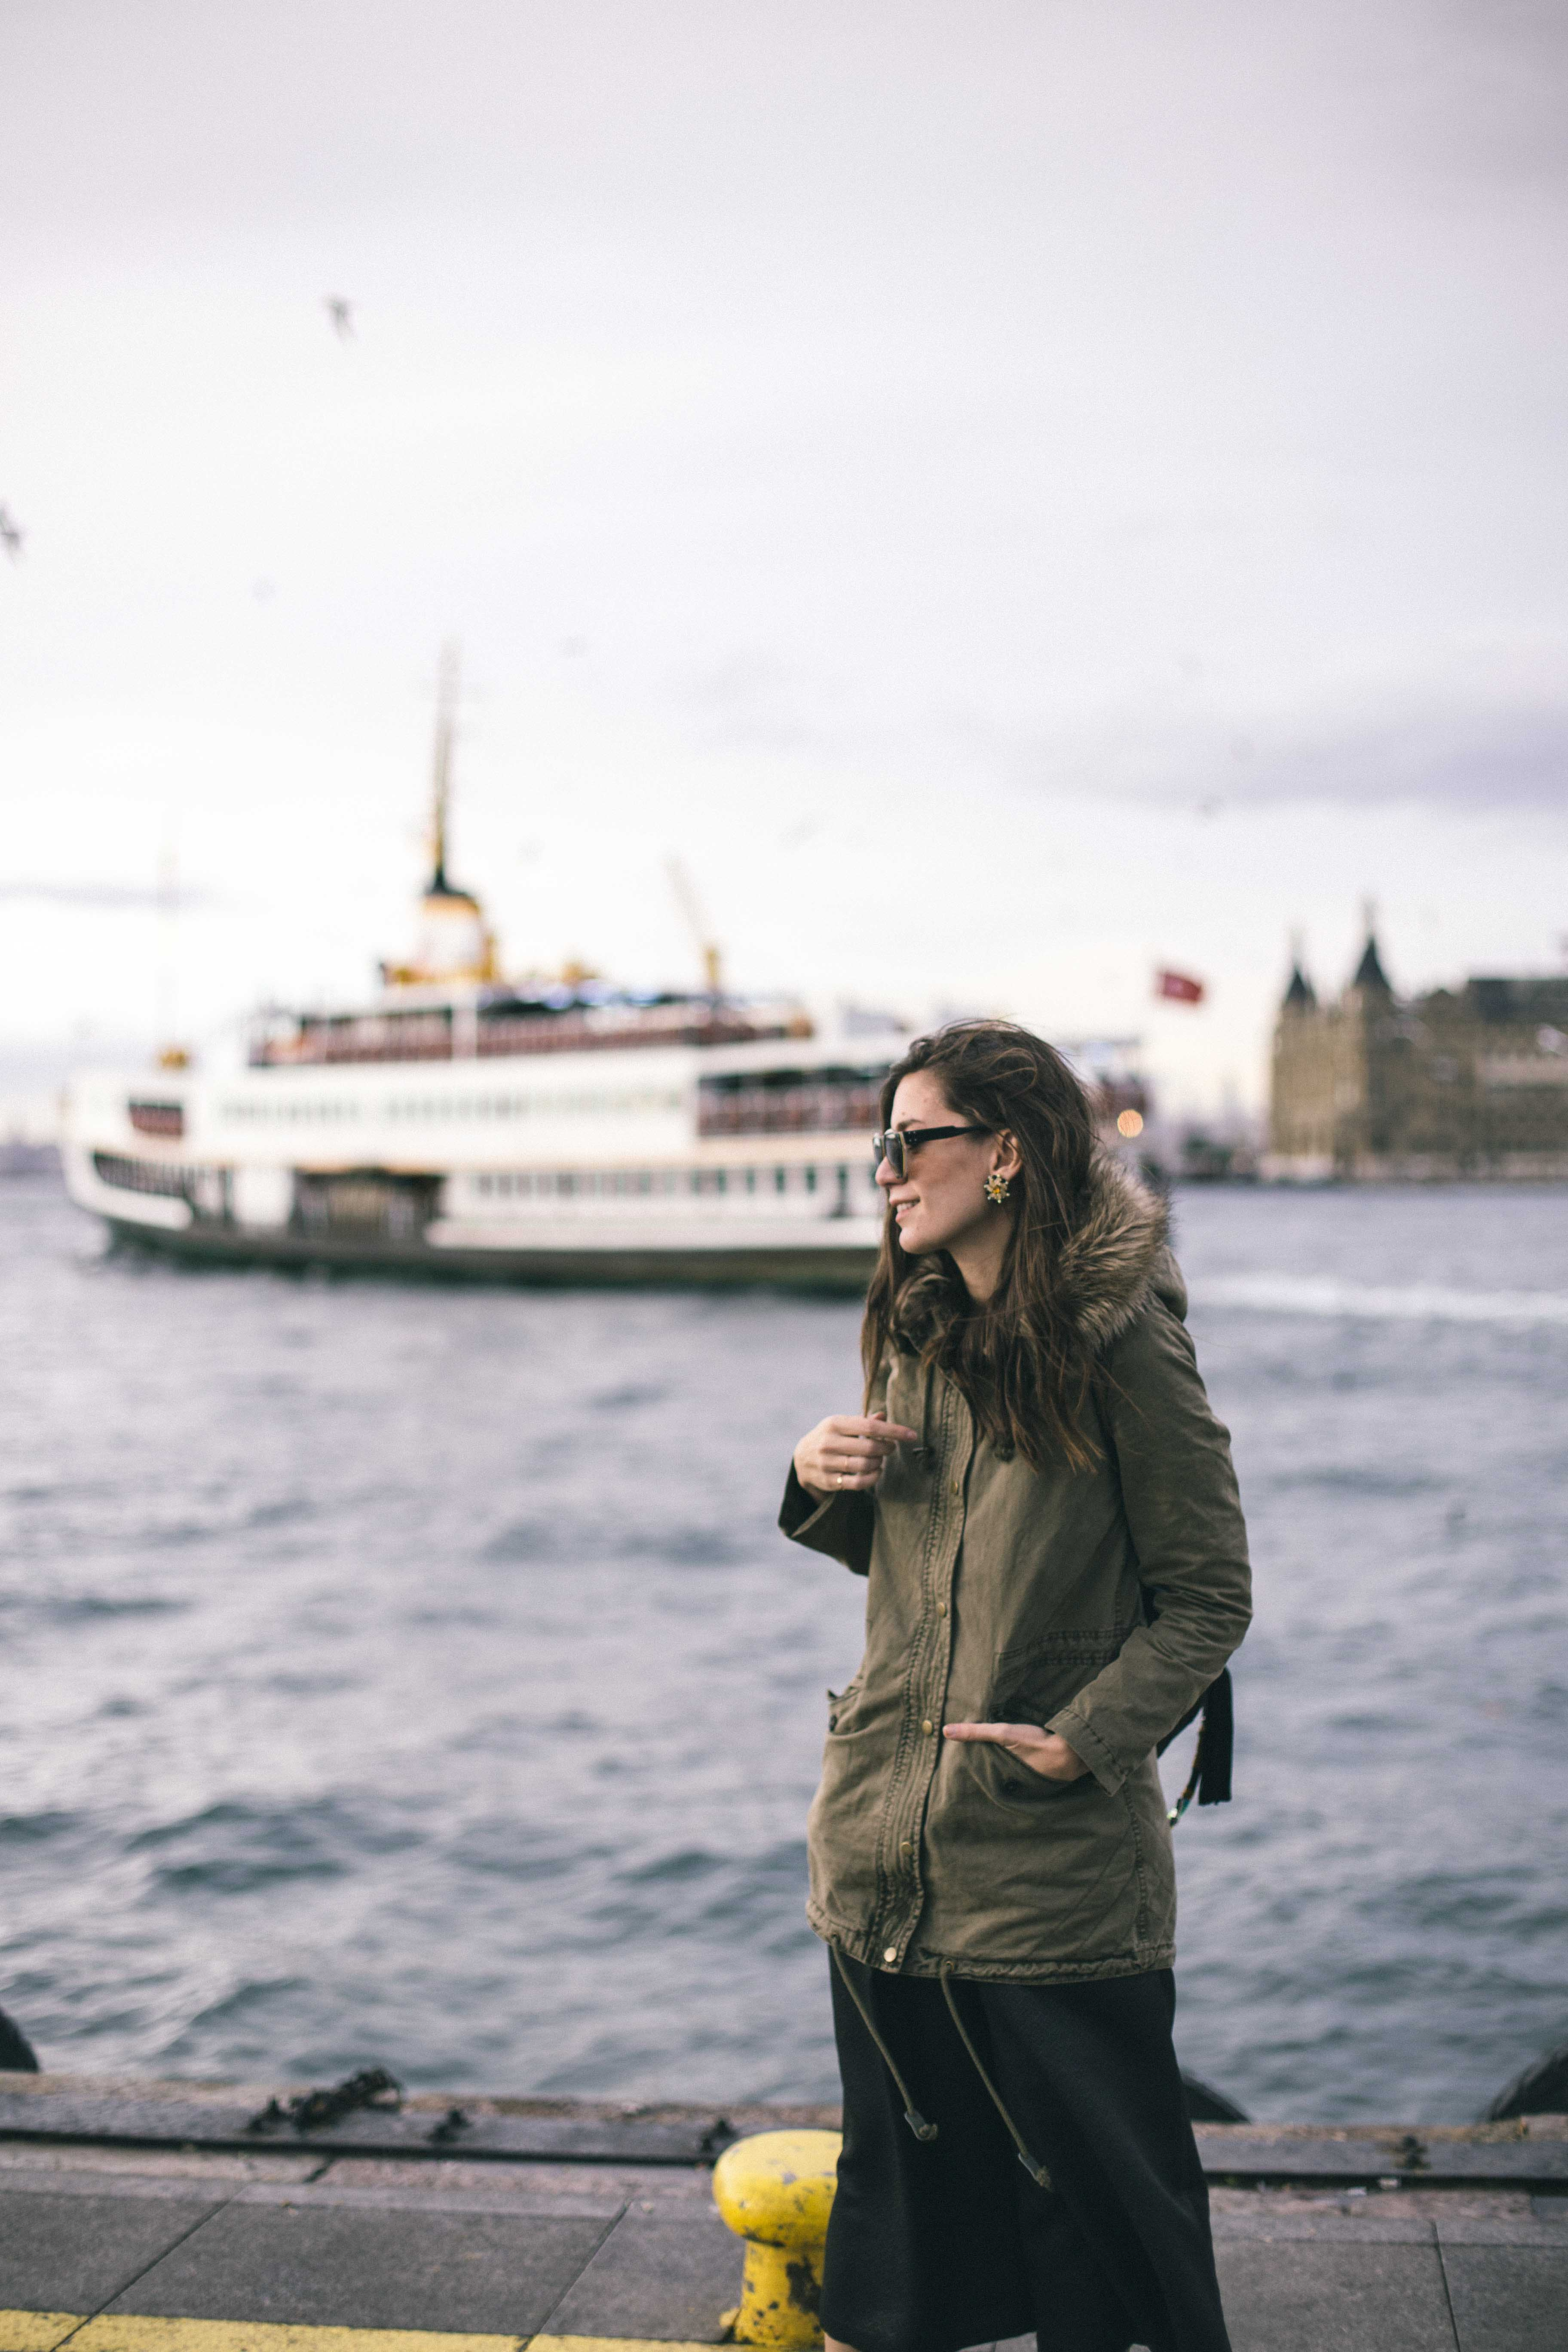 billur saatci, offnegiysem, turkish style blogger, street style, fashion, ootd, blogger, istanbul, mavi, mavi jeans, parka, kadıköy vapuru,